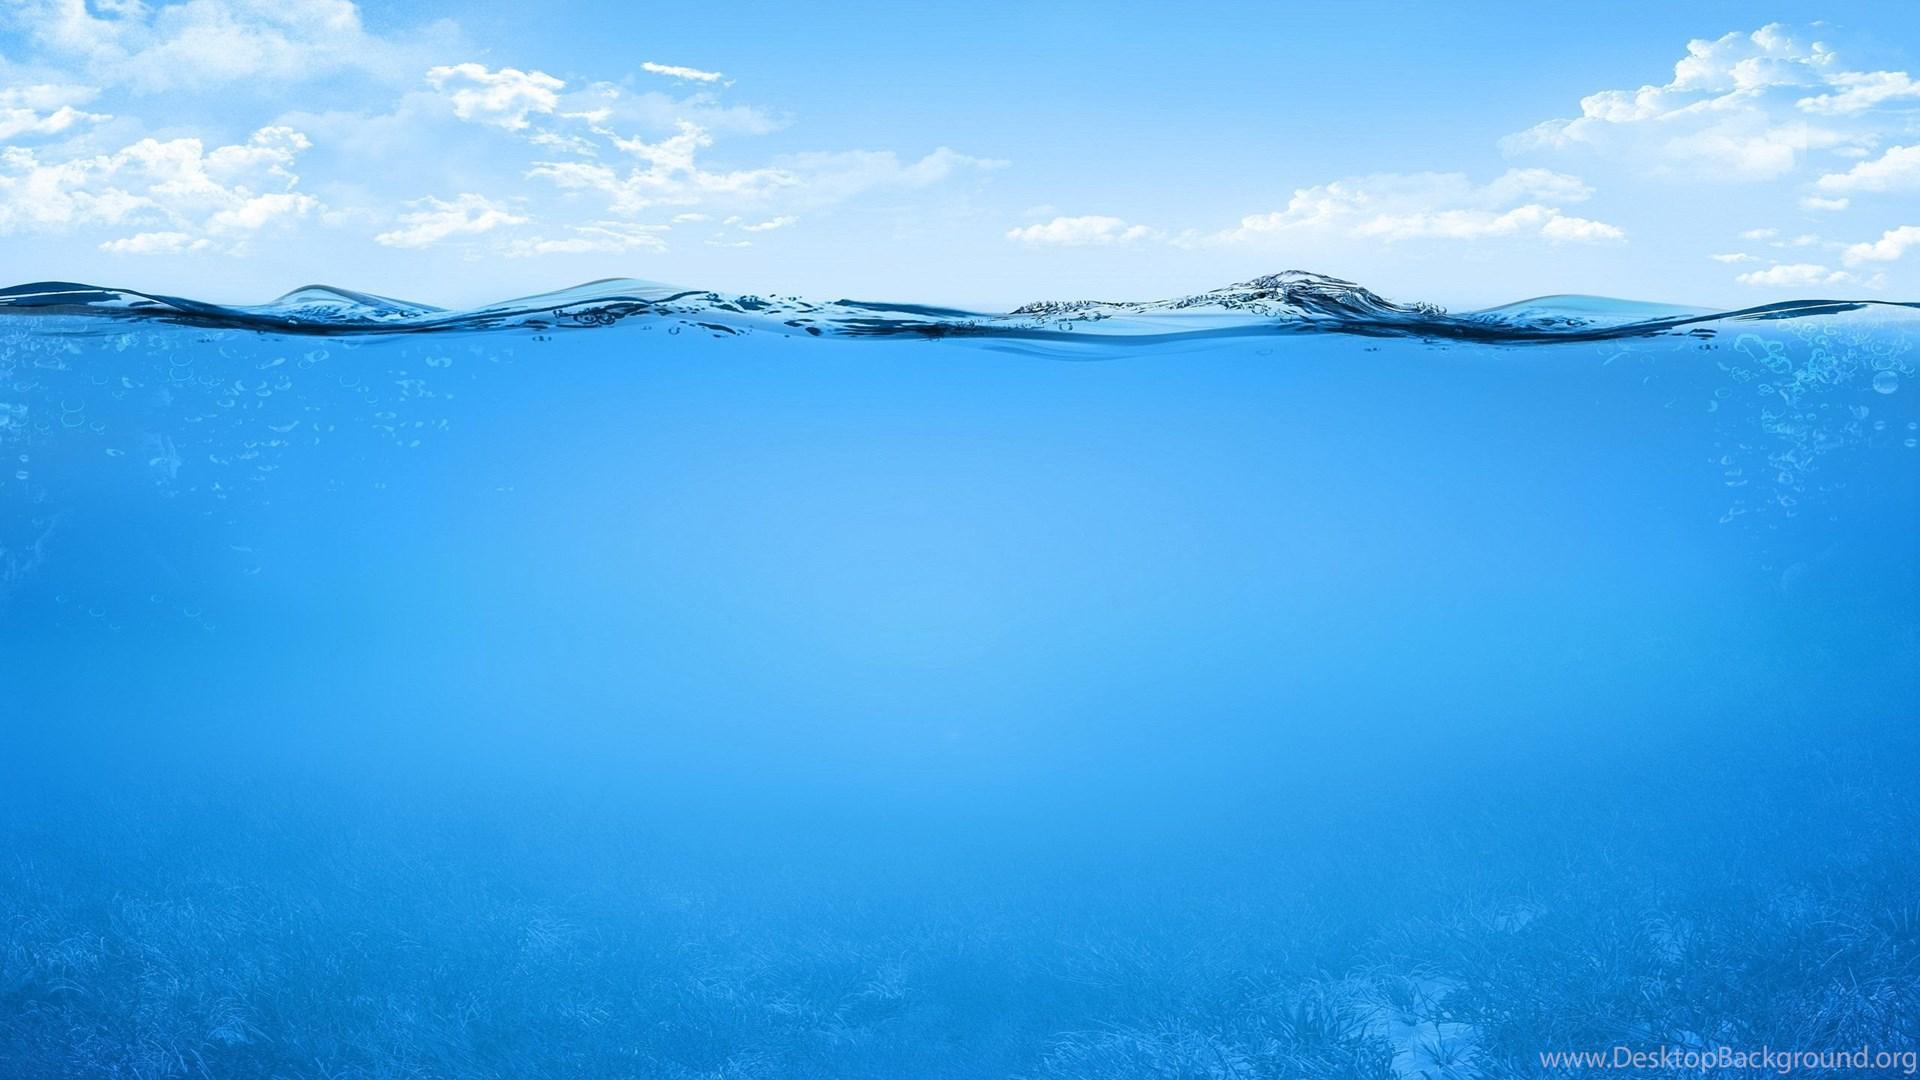 adenan hd wallpaper underwater - photo #35